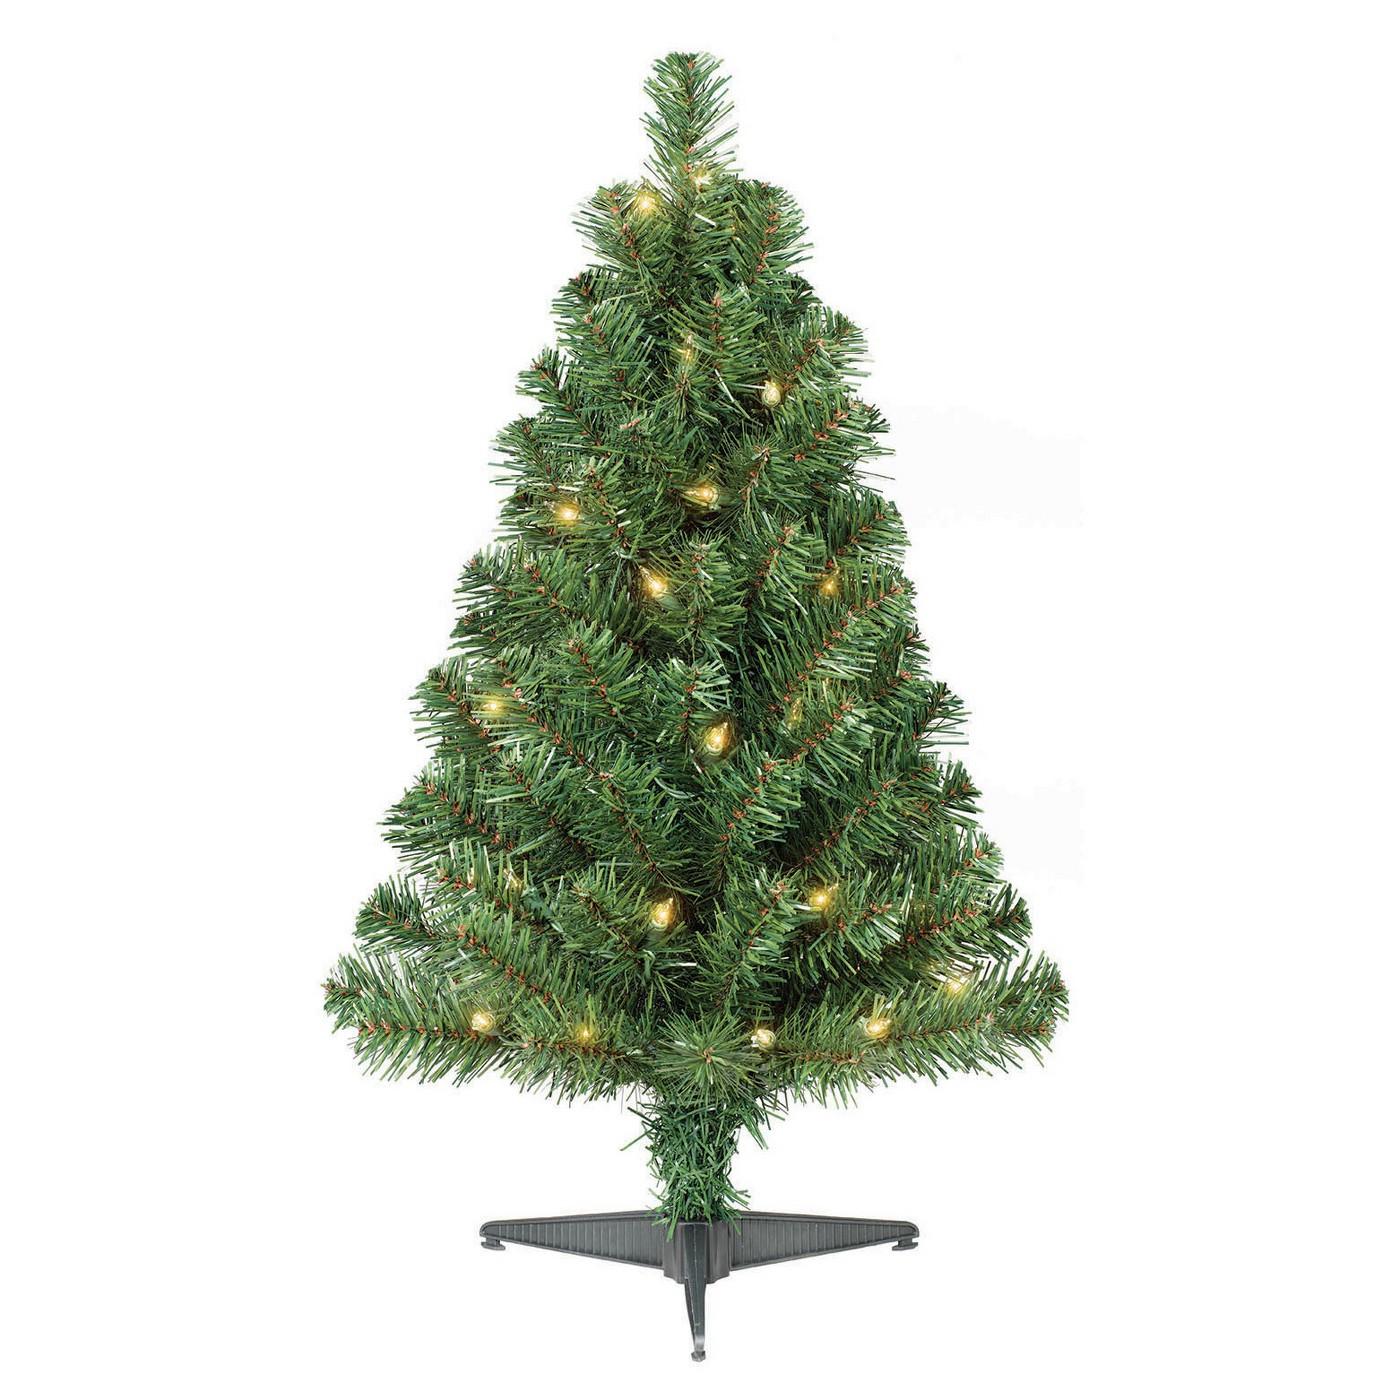 2ft Prelit Artificial Christmas Tree Alberta Spruce Clear Lights - Wondershop™ - image 1 of 4